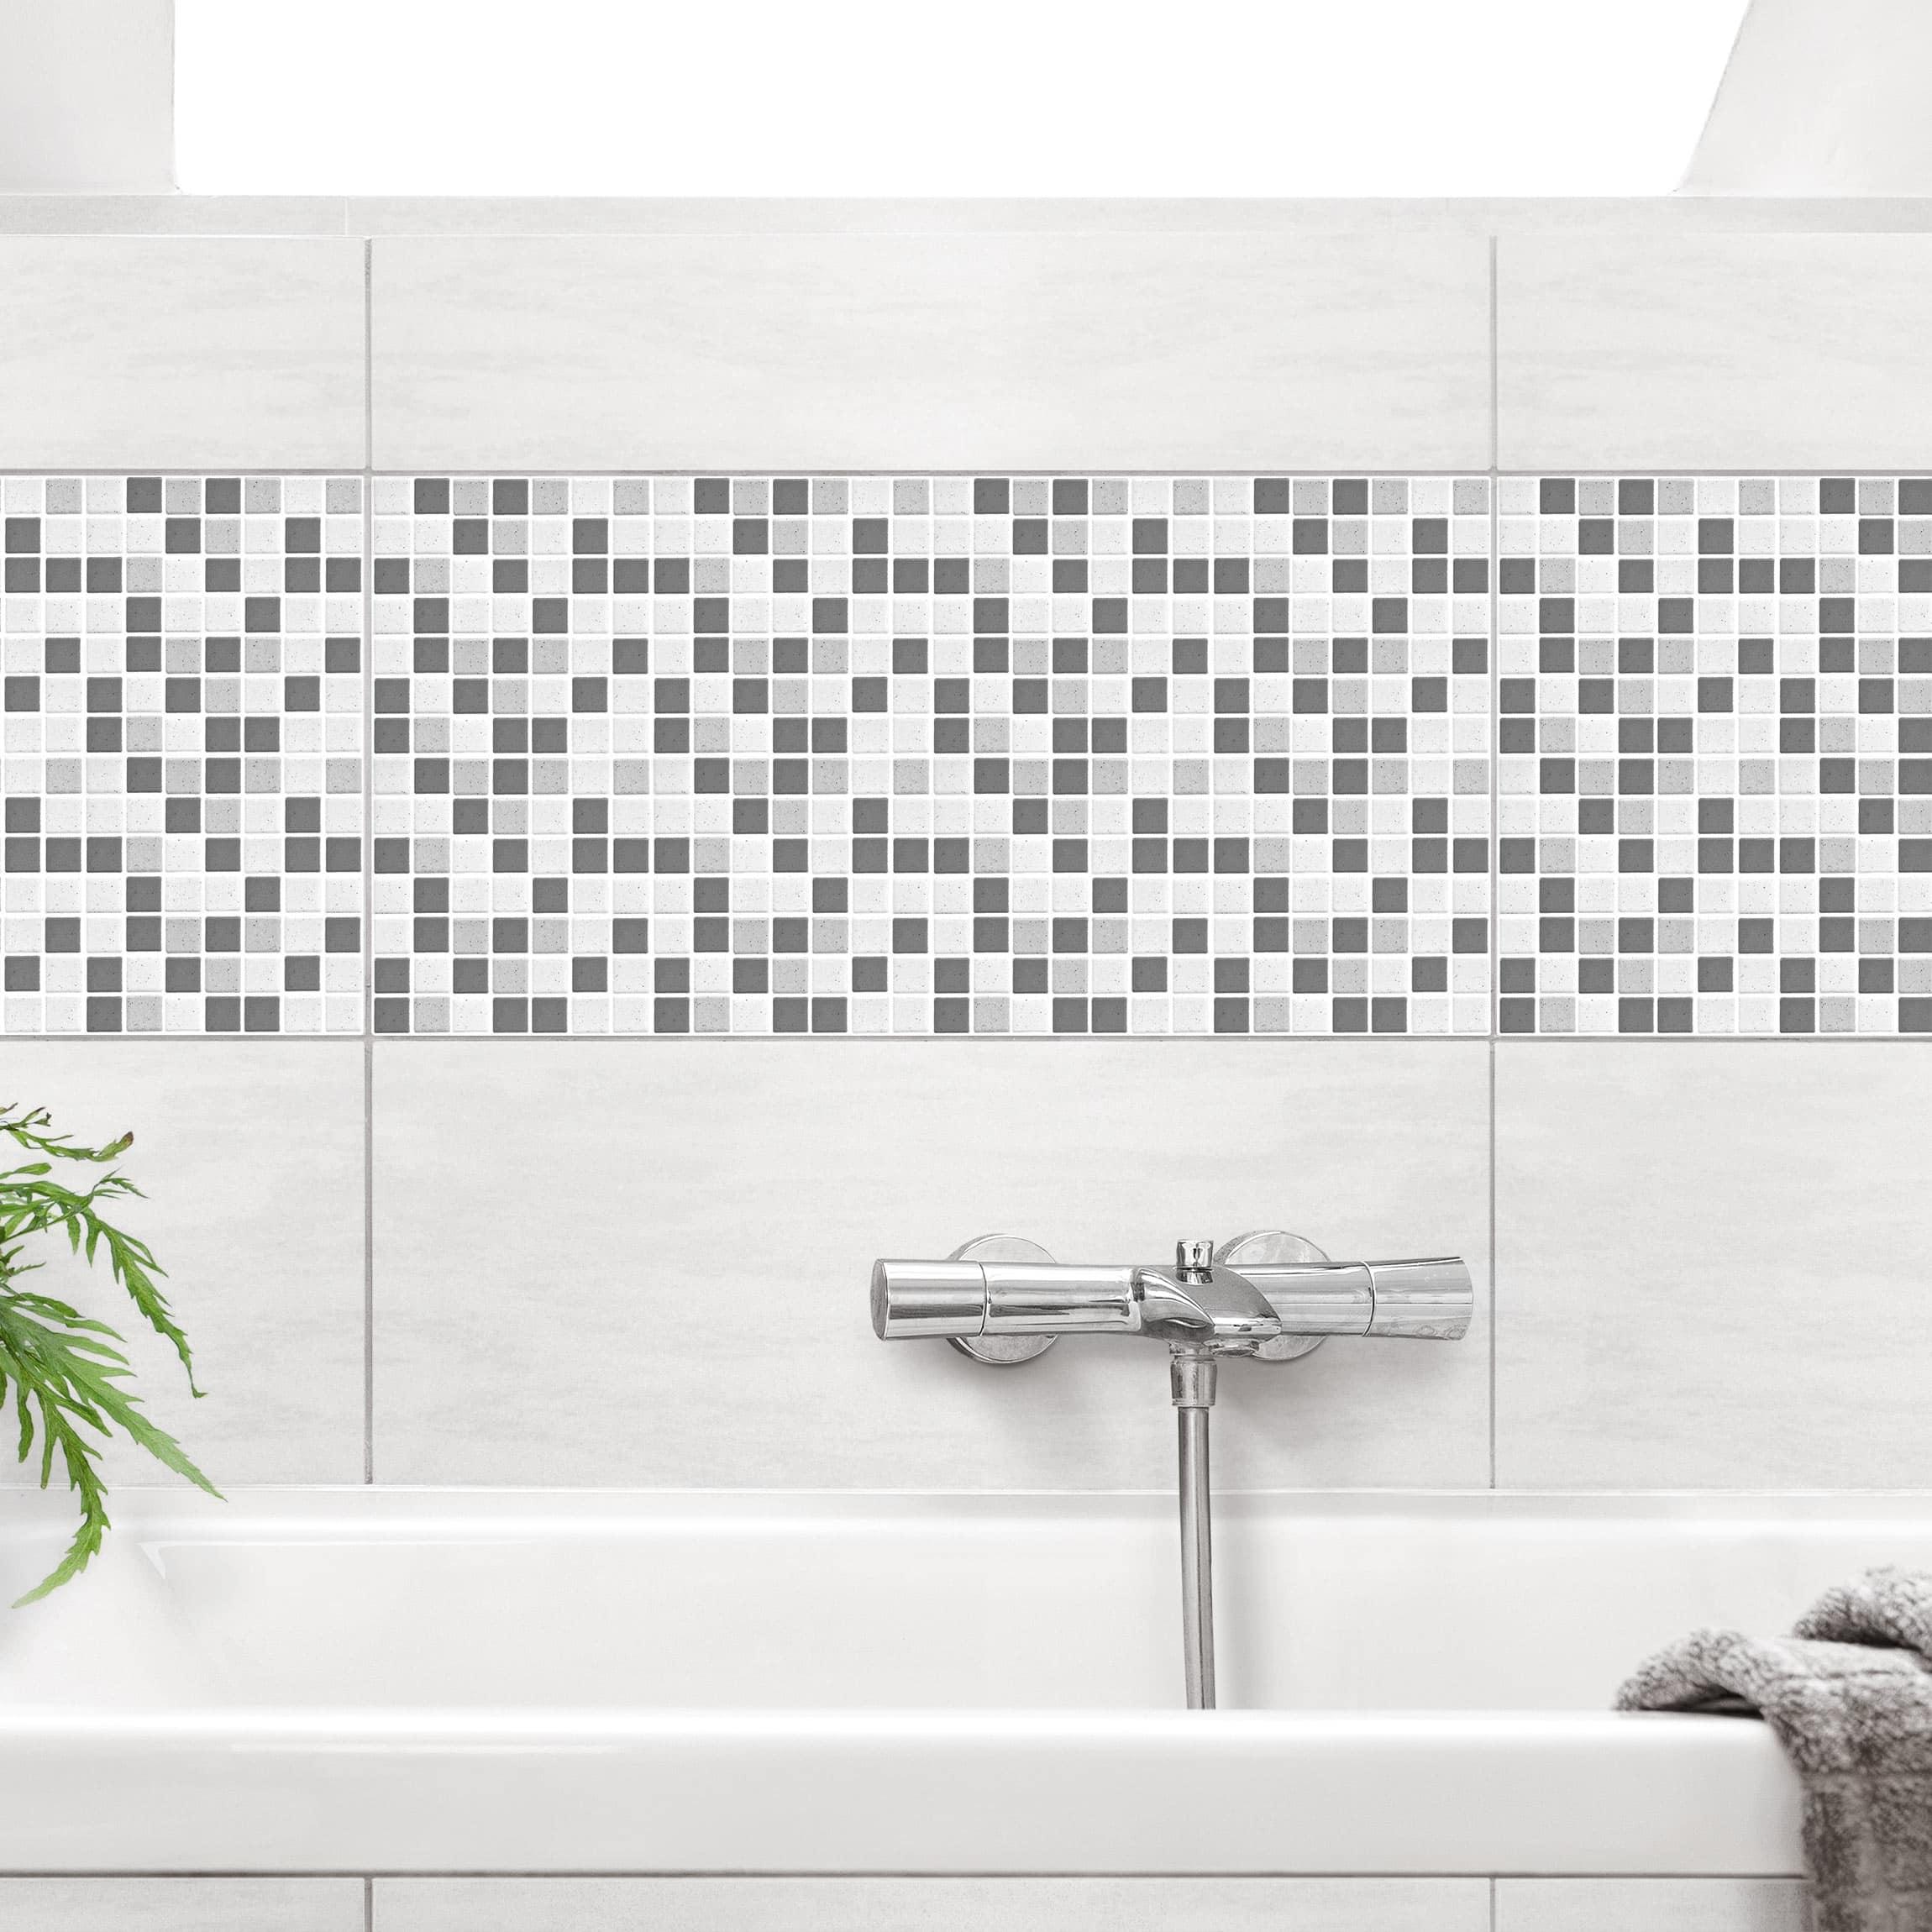 Fliesen Bordure Mosaikfliesen Grau 60x30 Fliesensticker Set